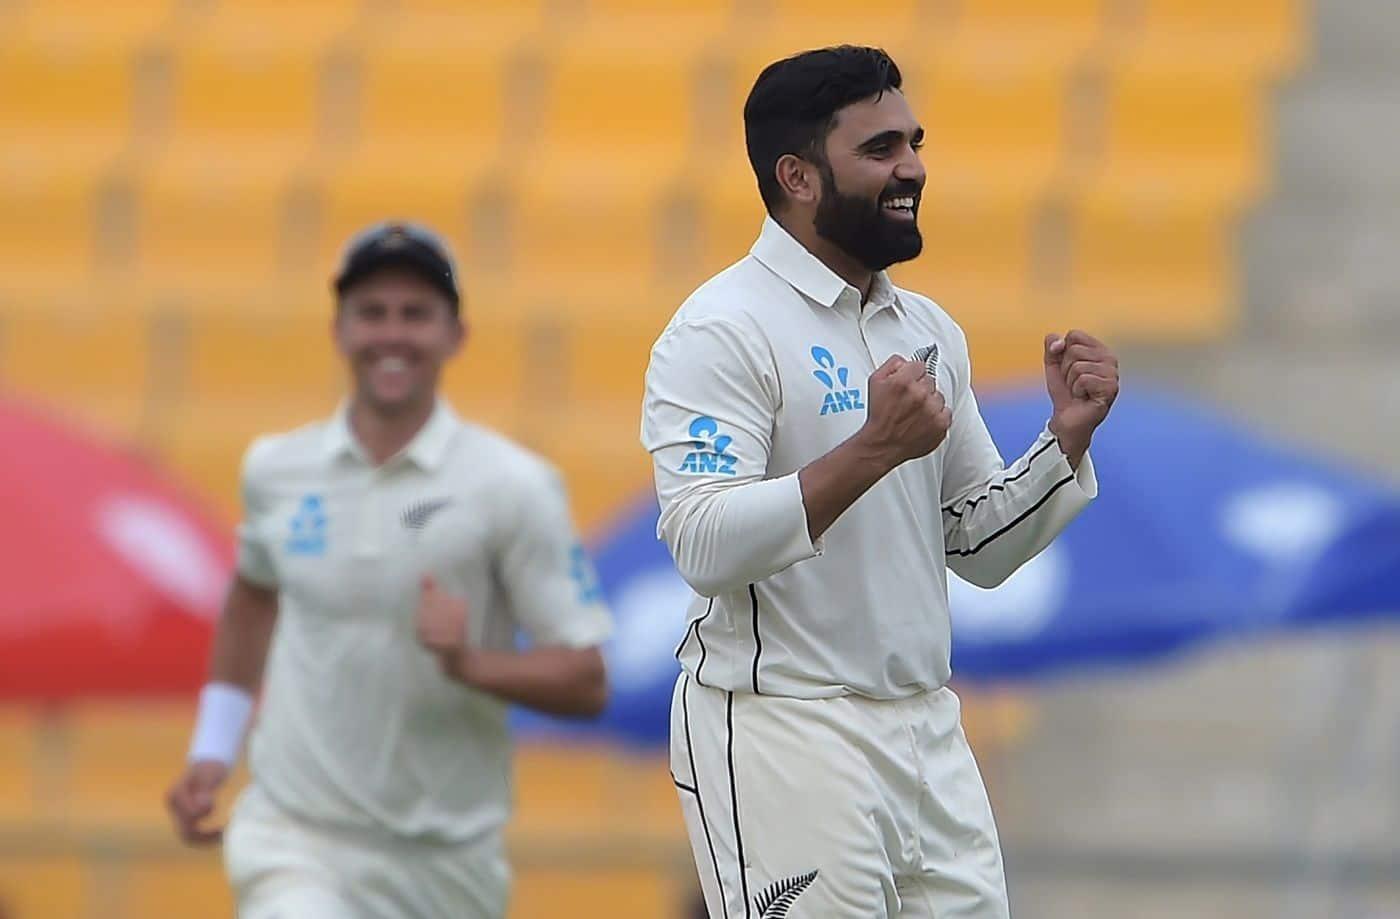 Ajaz Patel shines, New Zealand beat Pakistan by 4 runs In first test